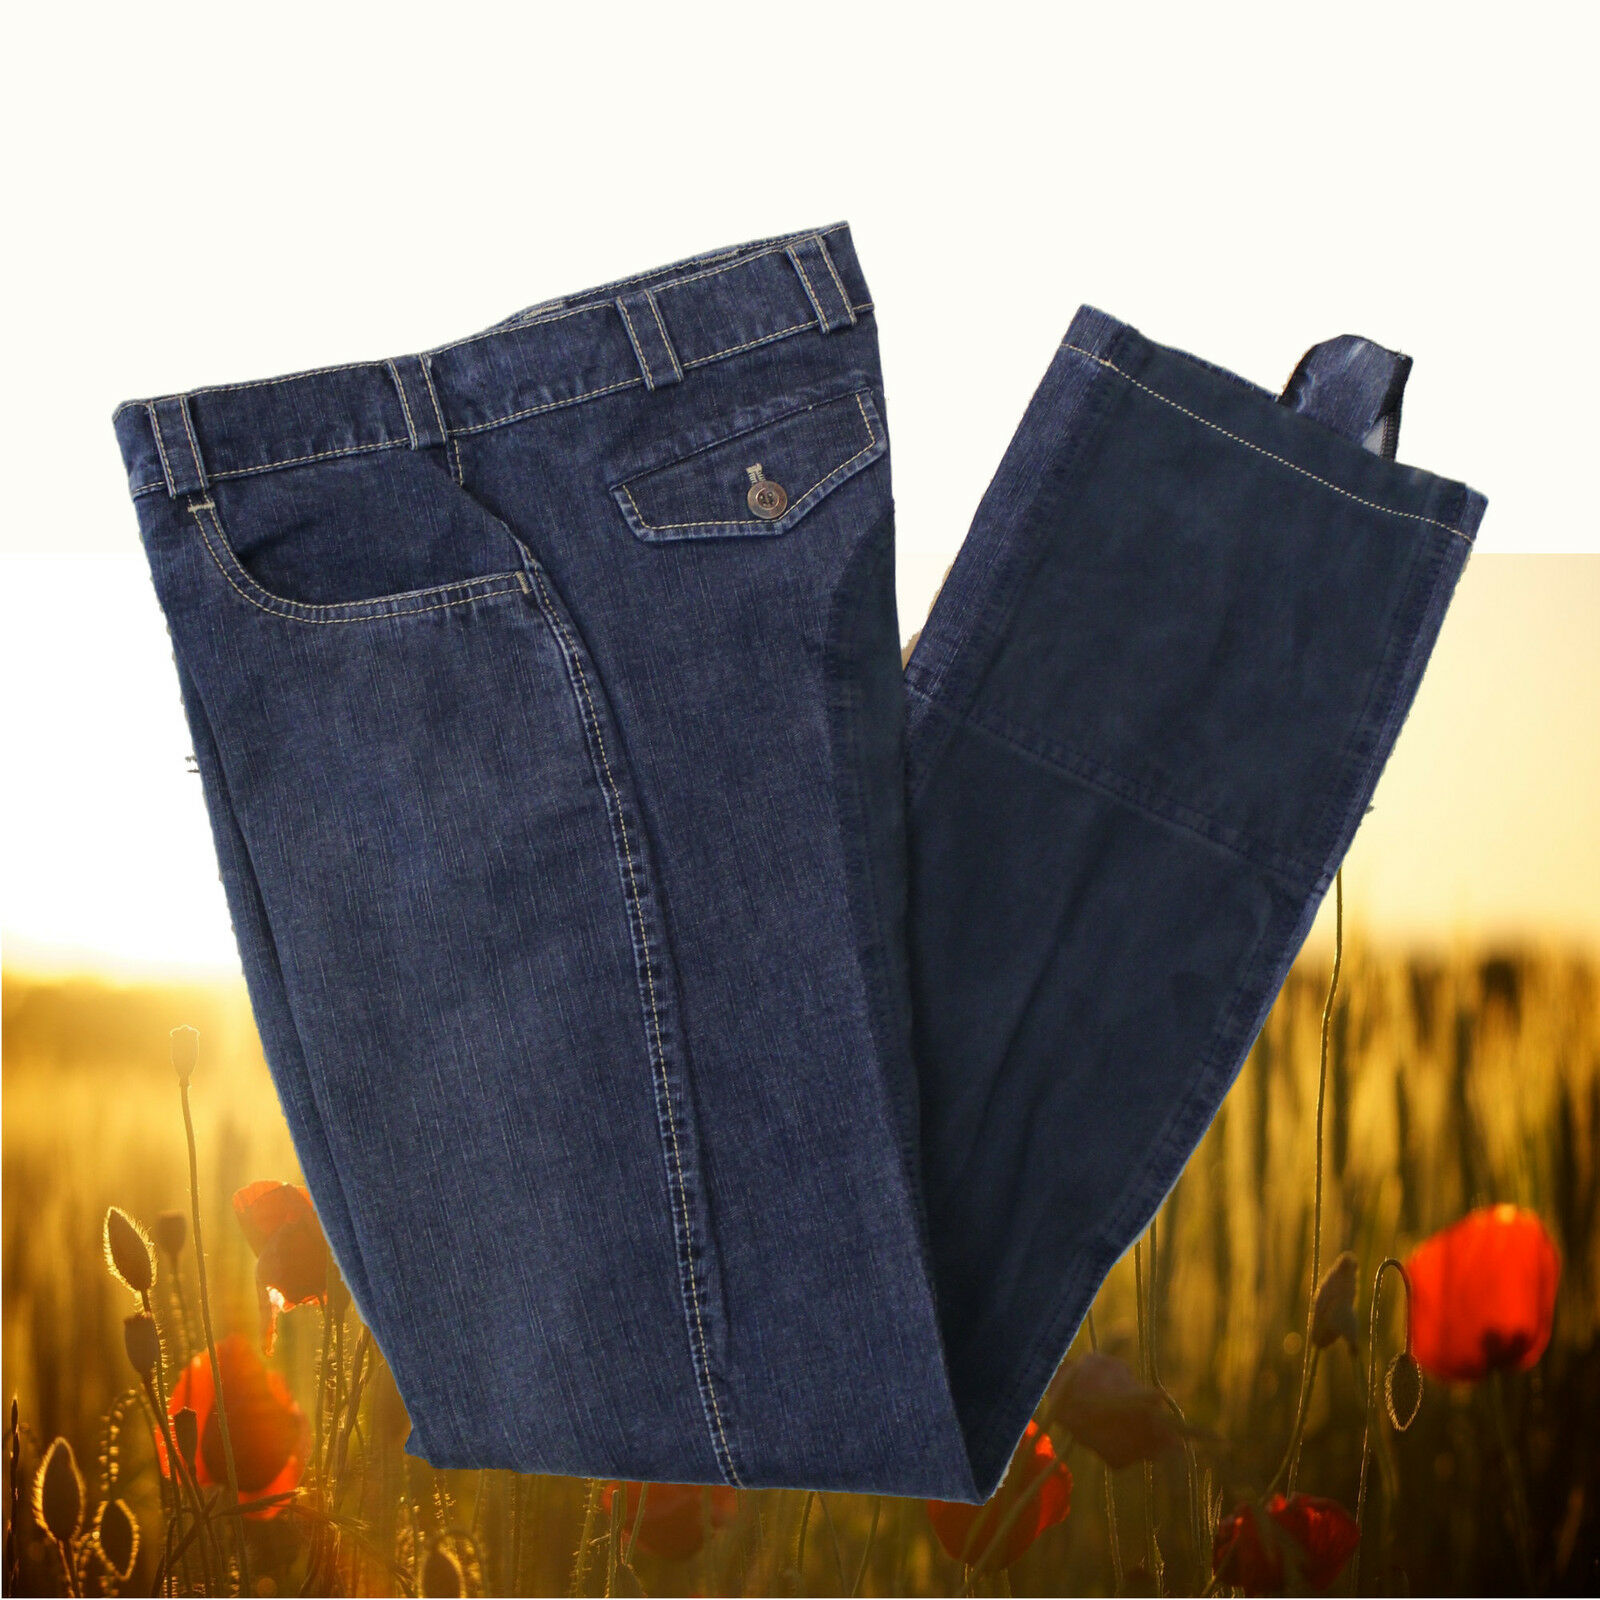 Pikeur Jodhpur Reithose Cassina Jeans blau, Pikeur Jodhpurreithose Cassina